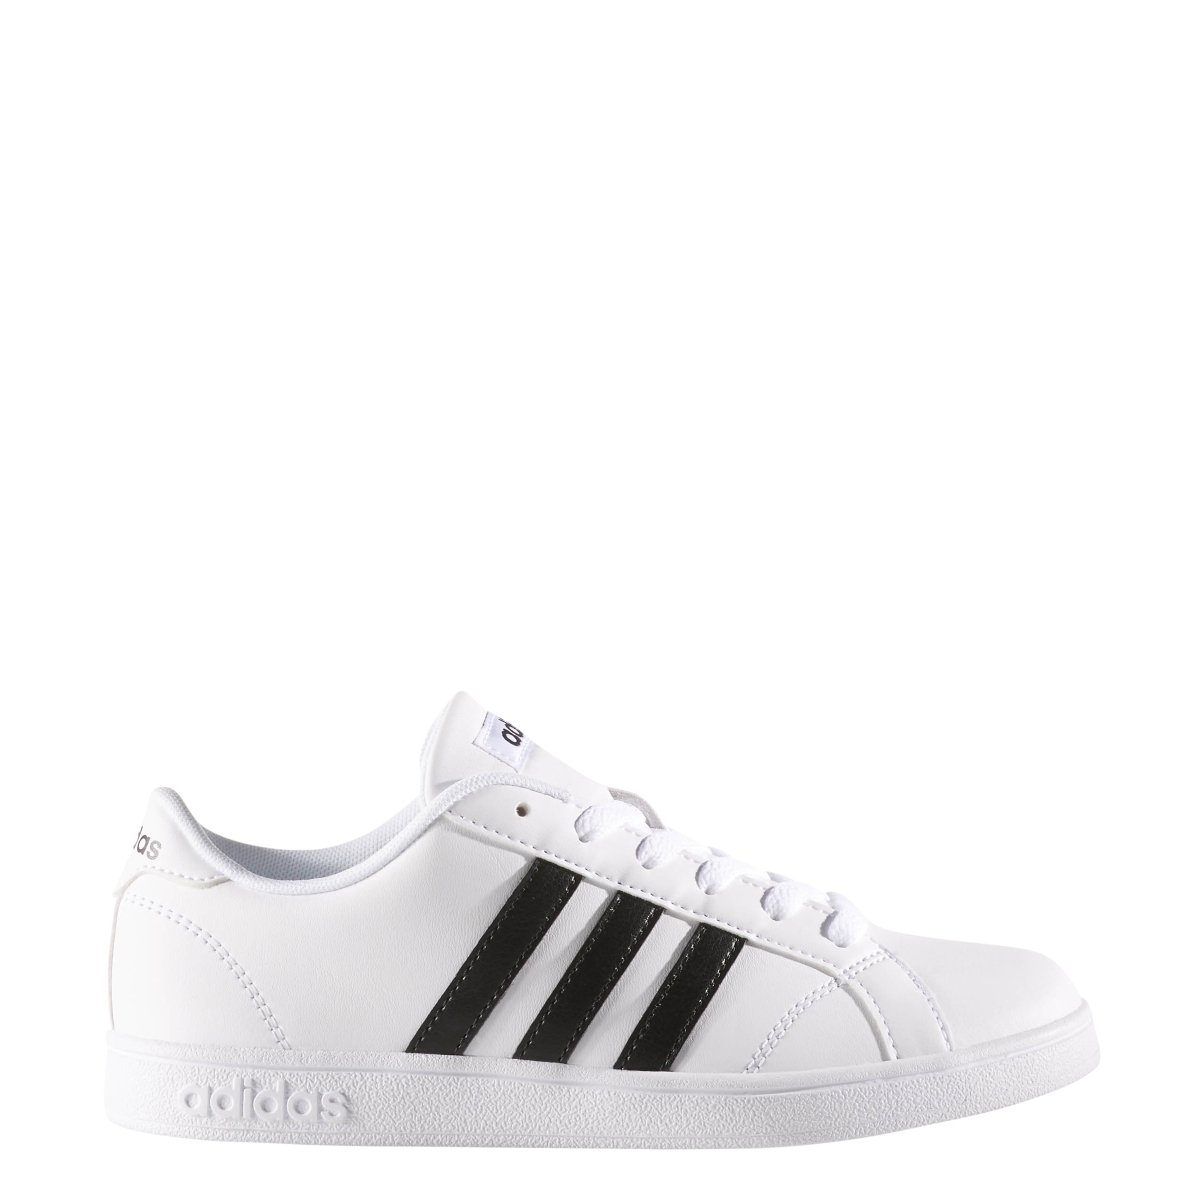 adidas Performance Unisex-Kids Baseline Sneaker, White/Black/White, 4.5 M US Big Kid